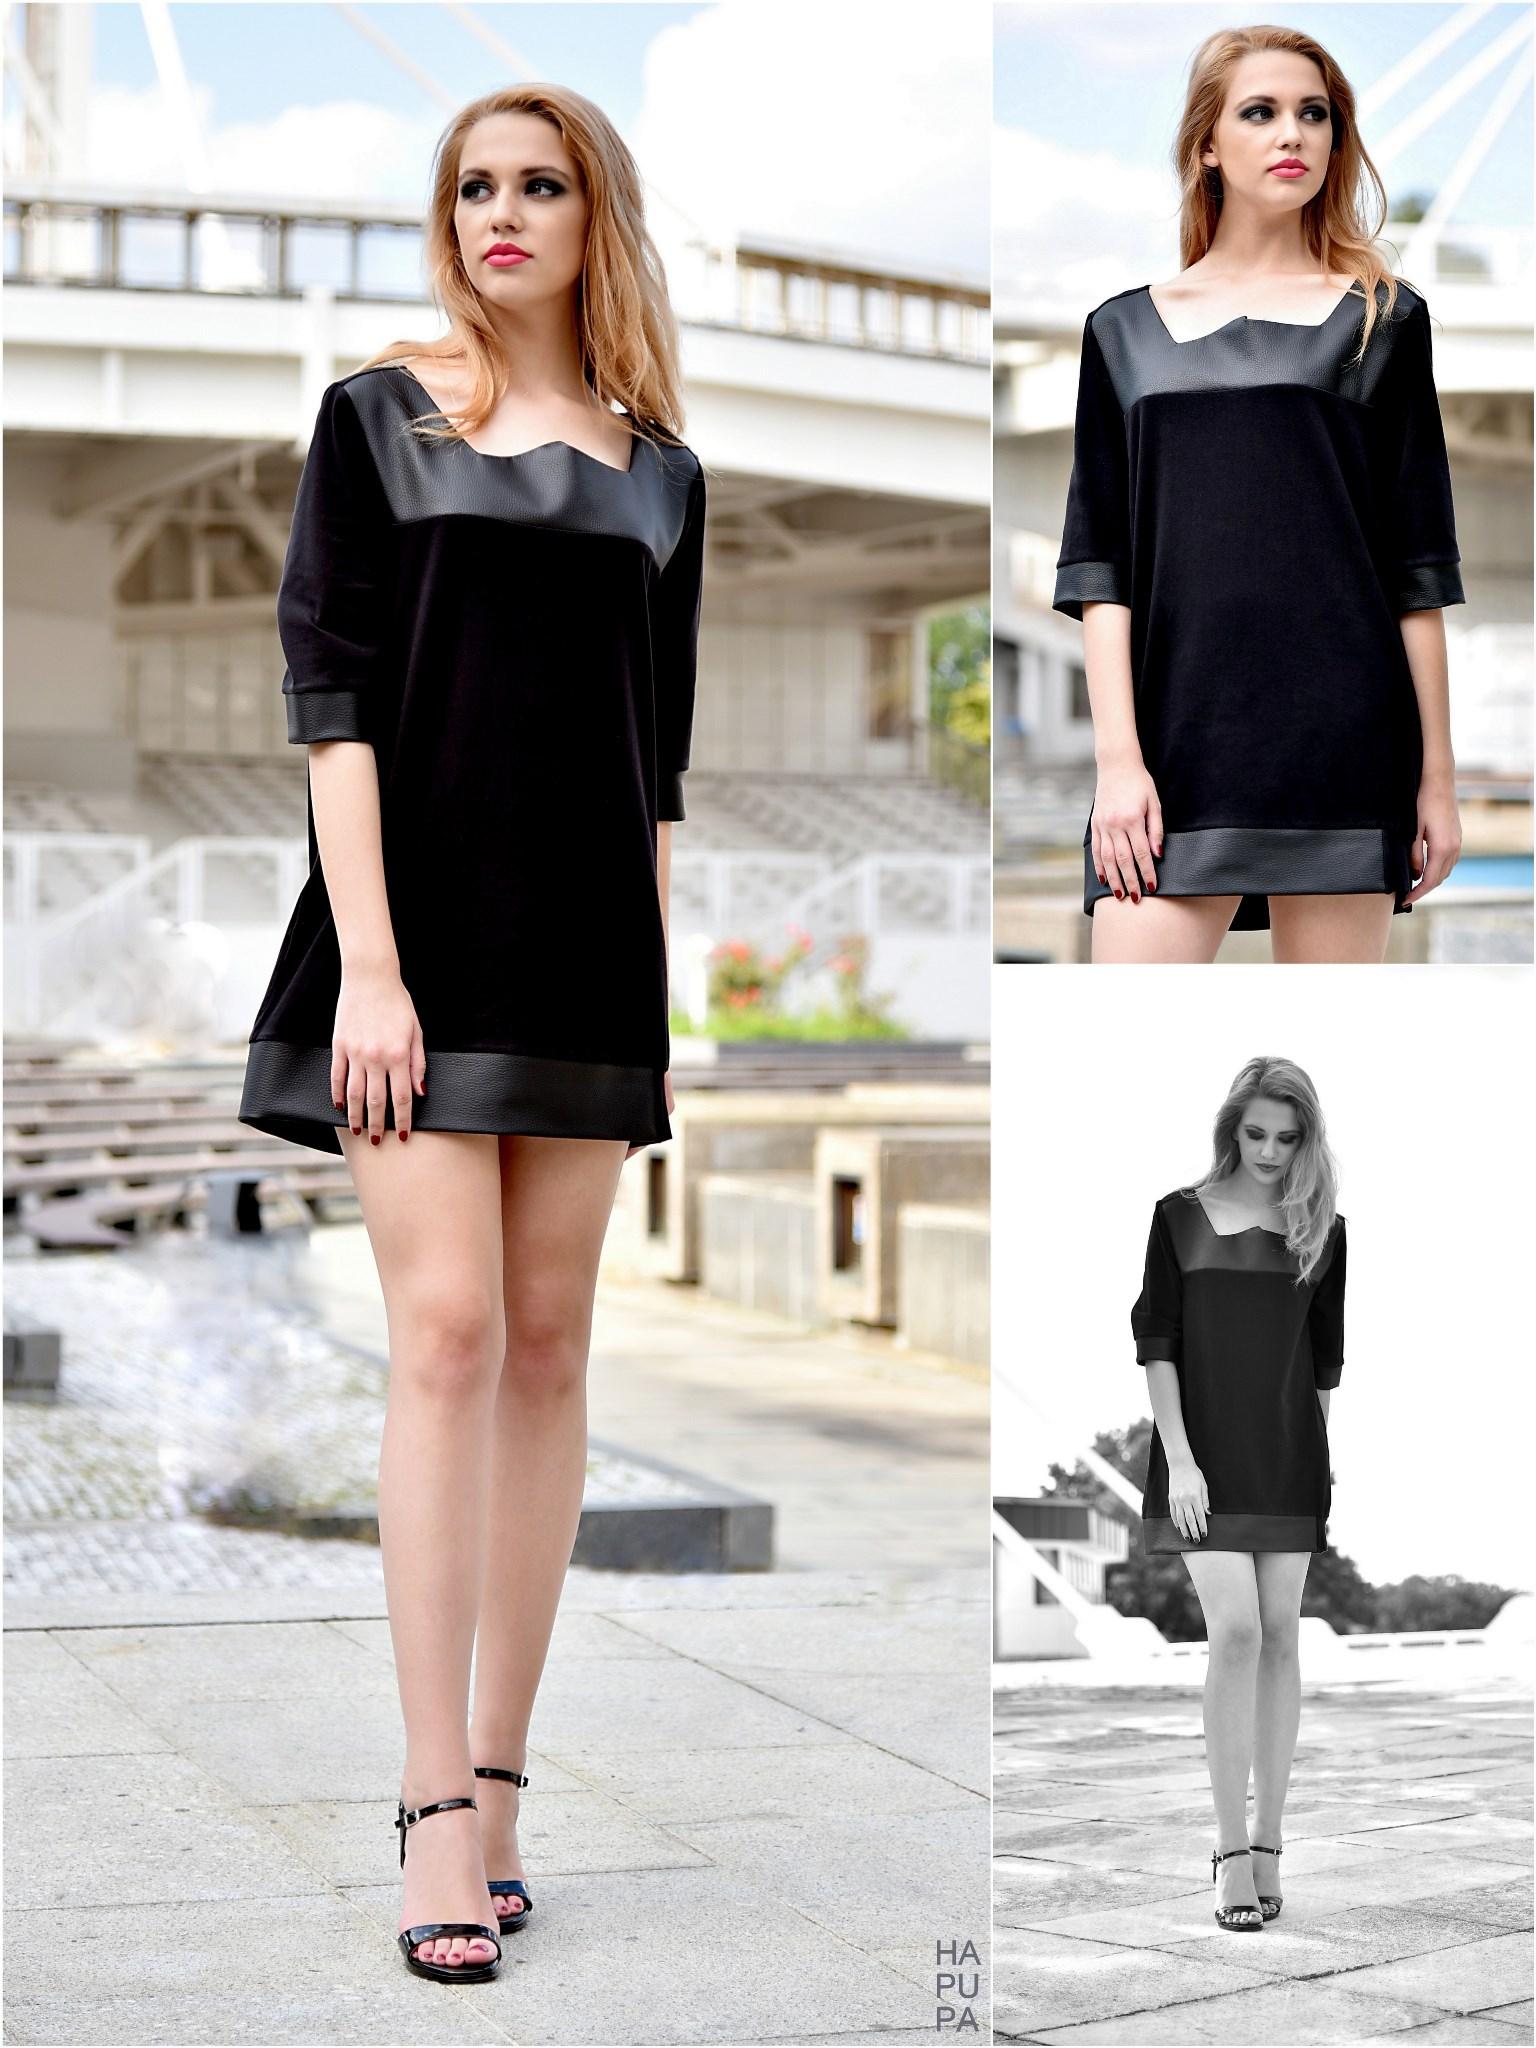 Fotografie pro model – Šaty skoženkovými detaily